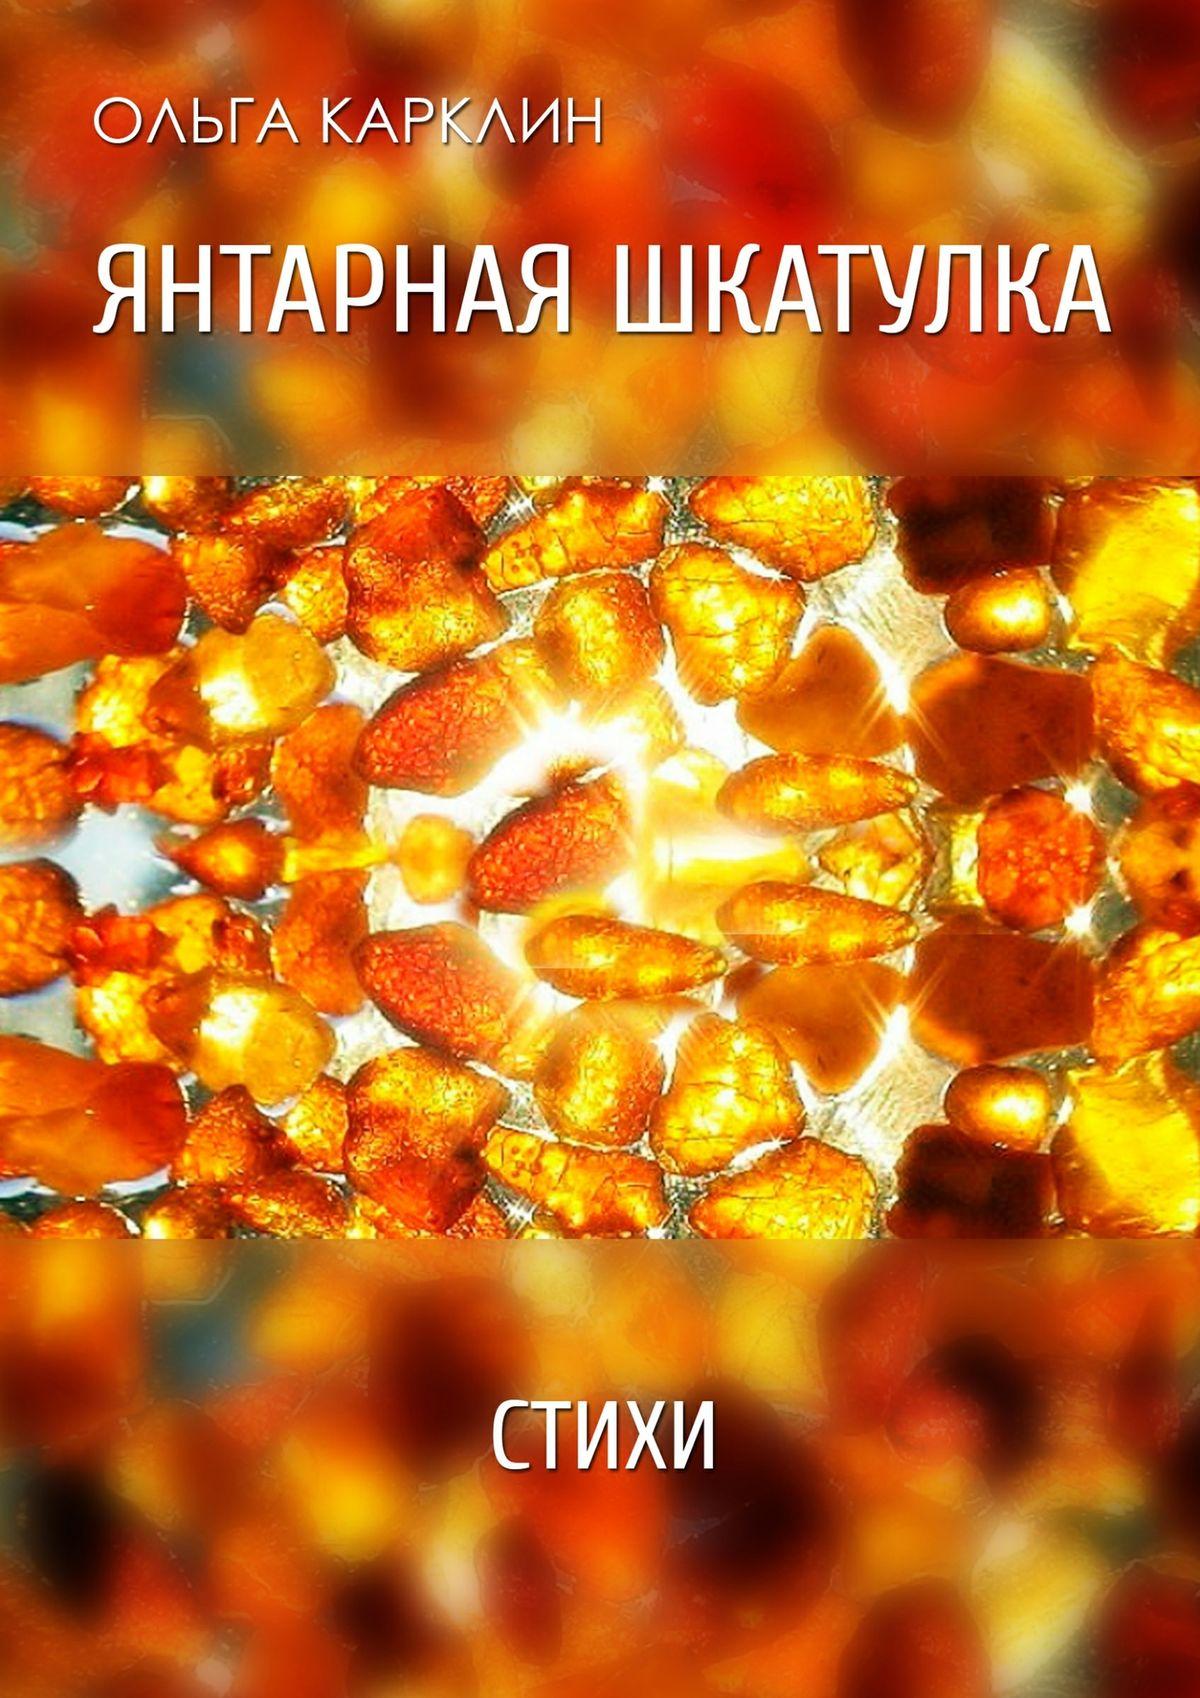 Ольга Карклин Янтарная шкатулка. Стихи все стихи